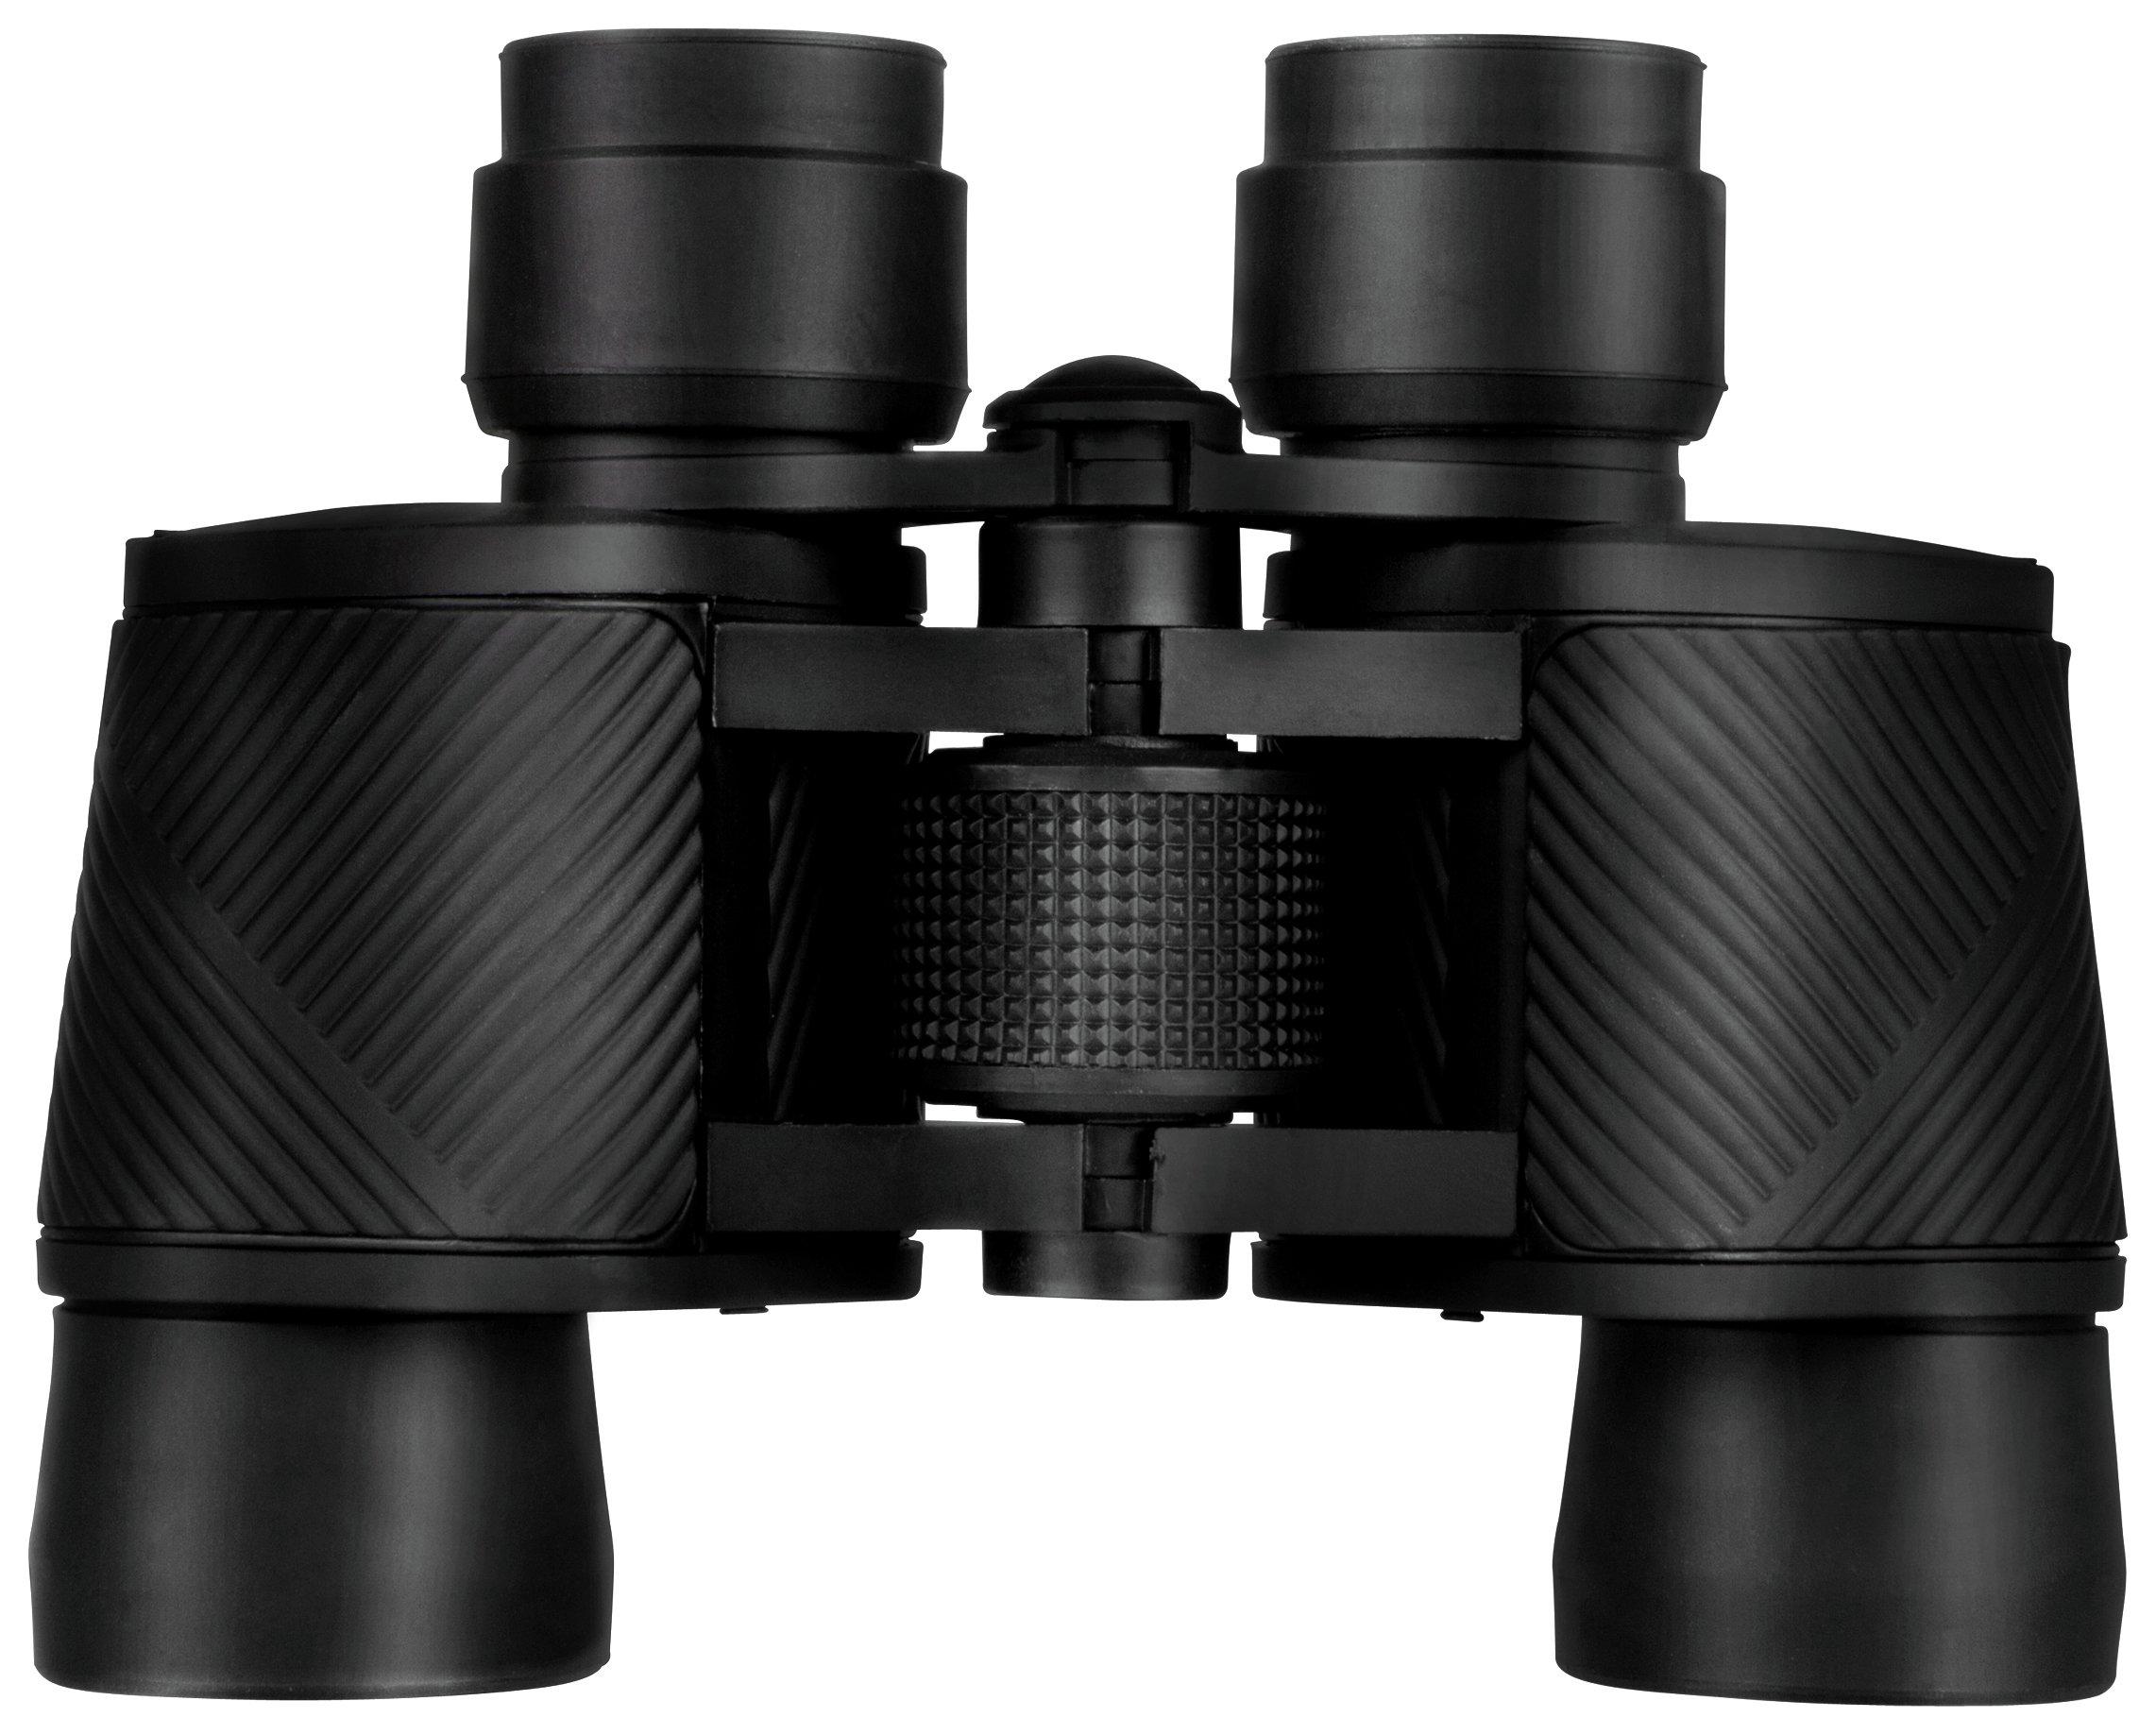 Polaroid IB1050 12 x 50 Porro Prism Binoculars